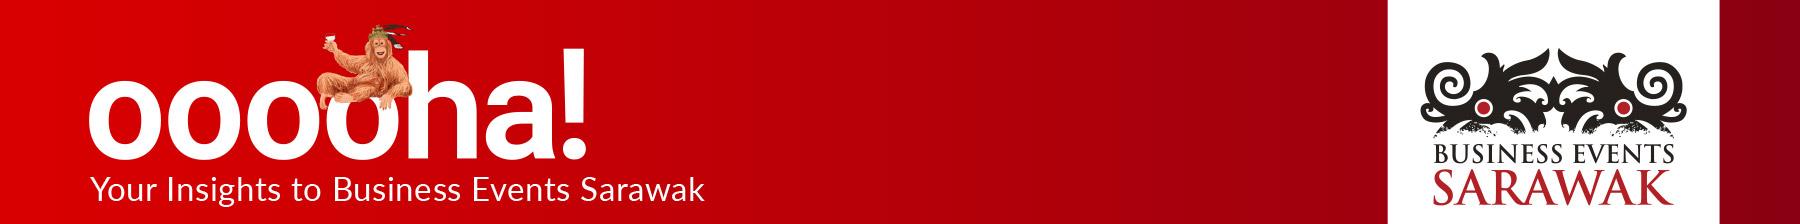 BESarawak Industry Related News – April 2020